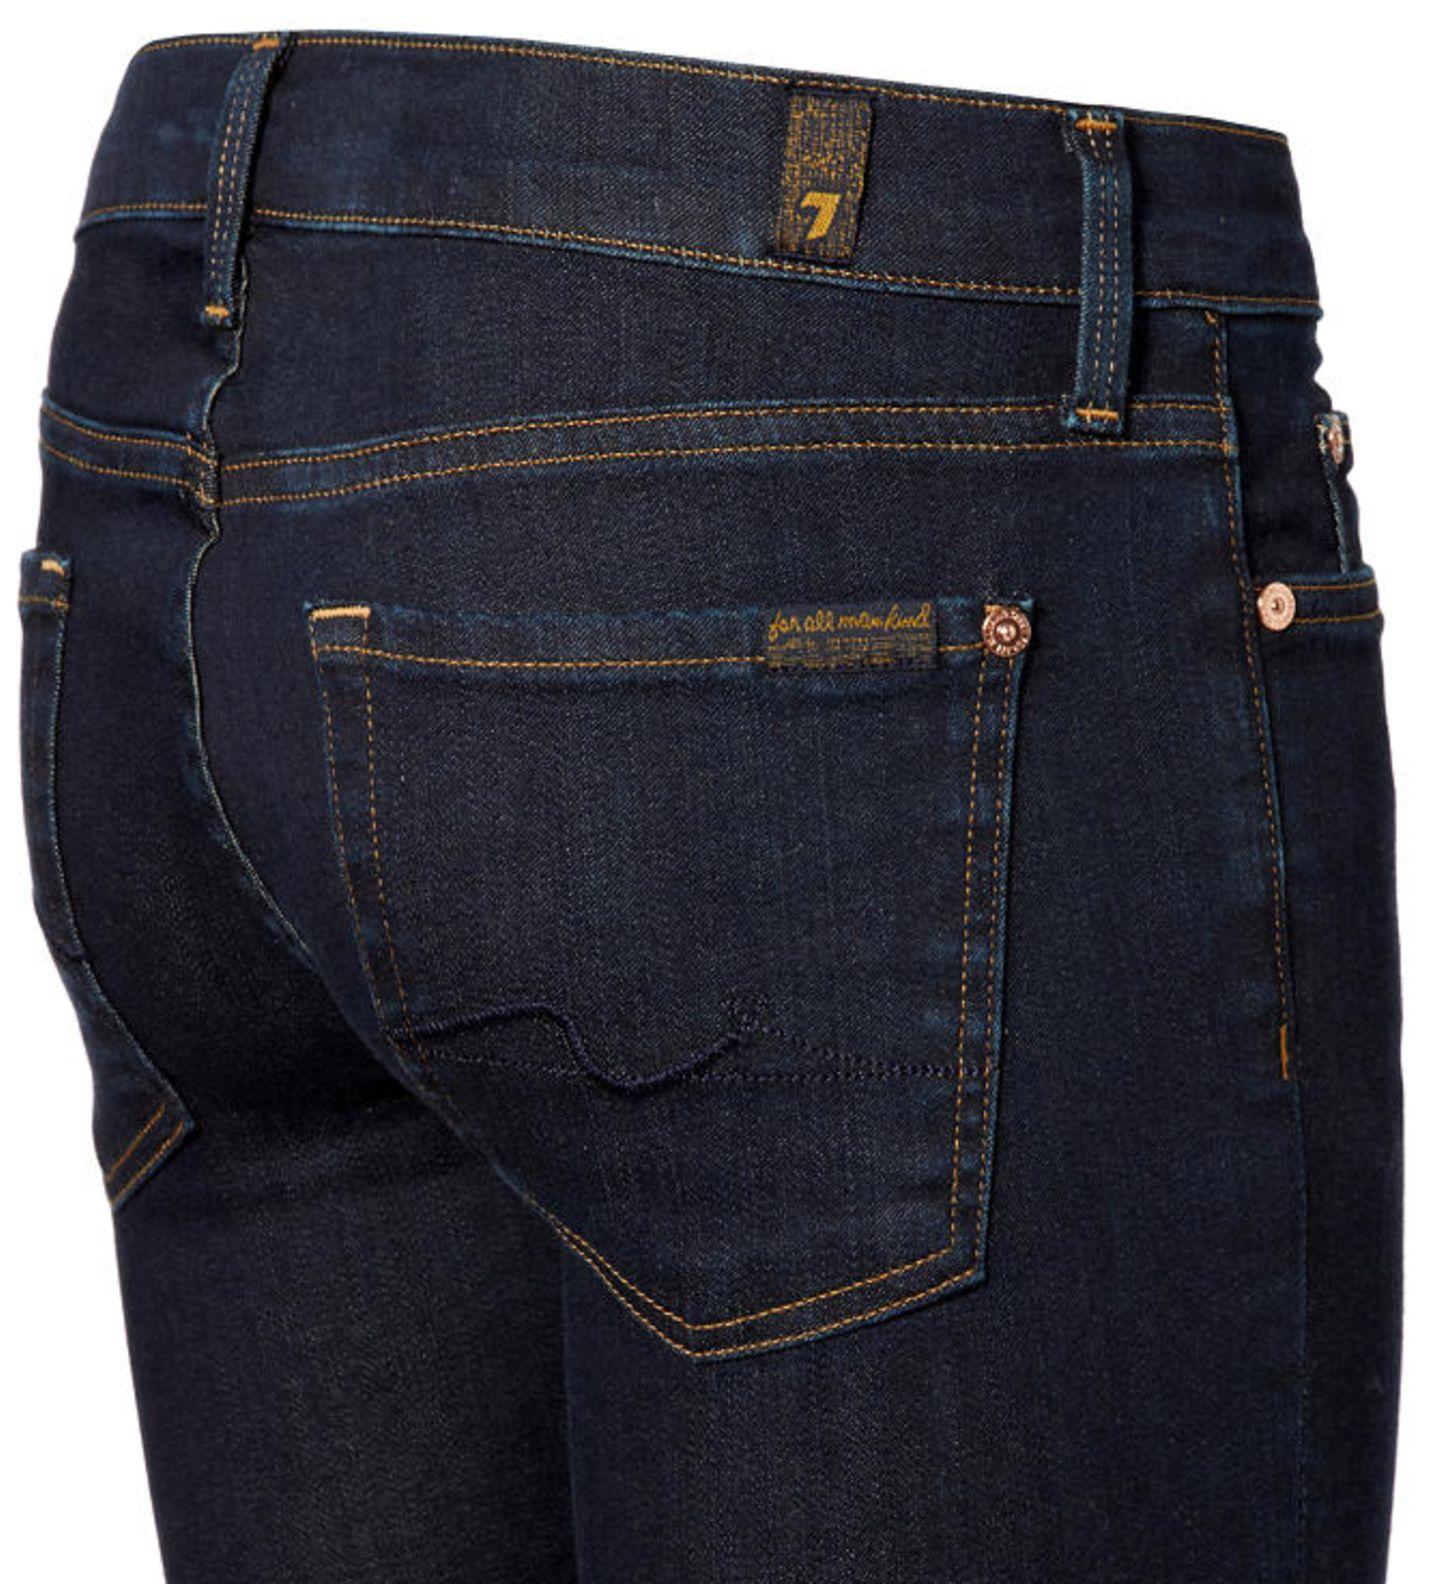 Figurberatung Jeans: Großer Po